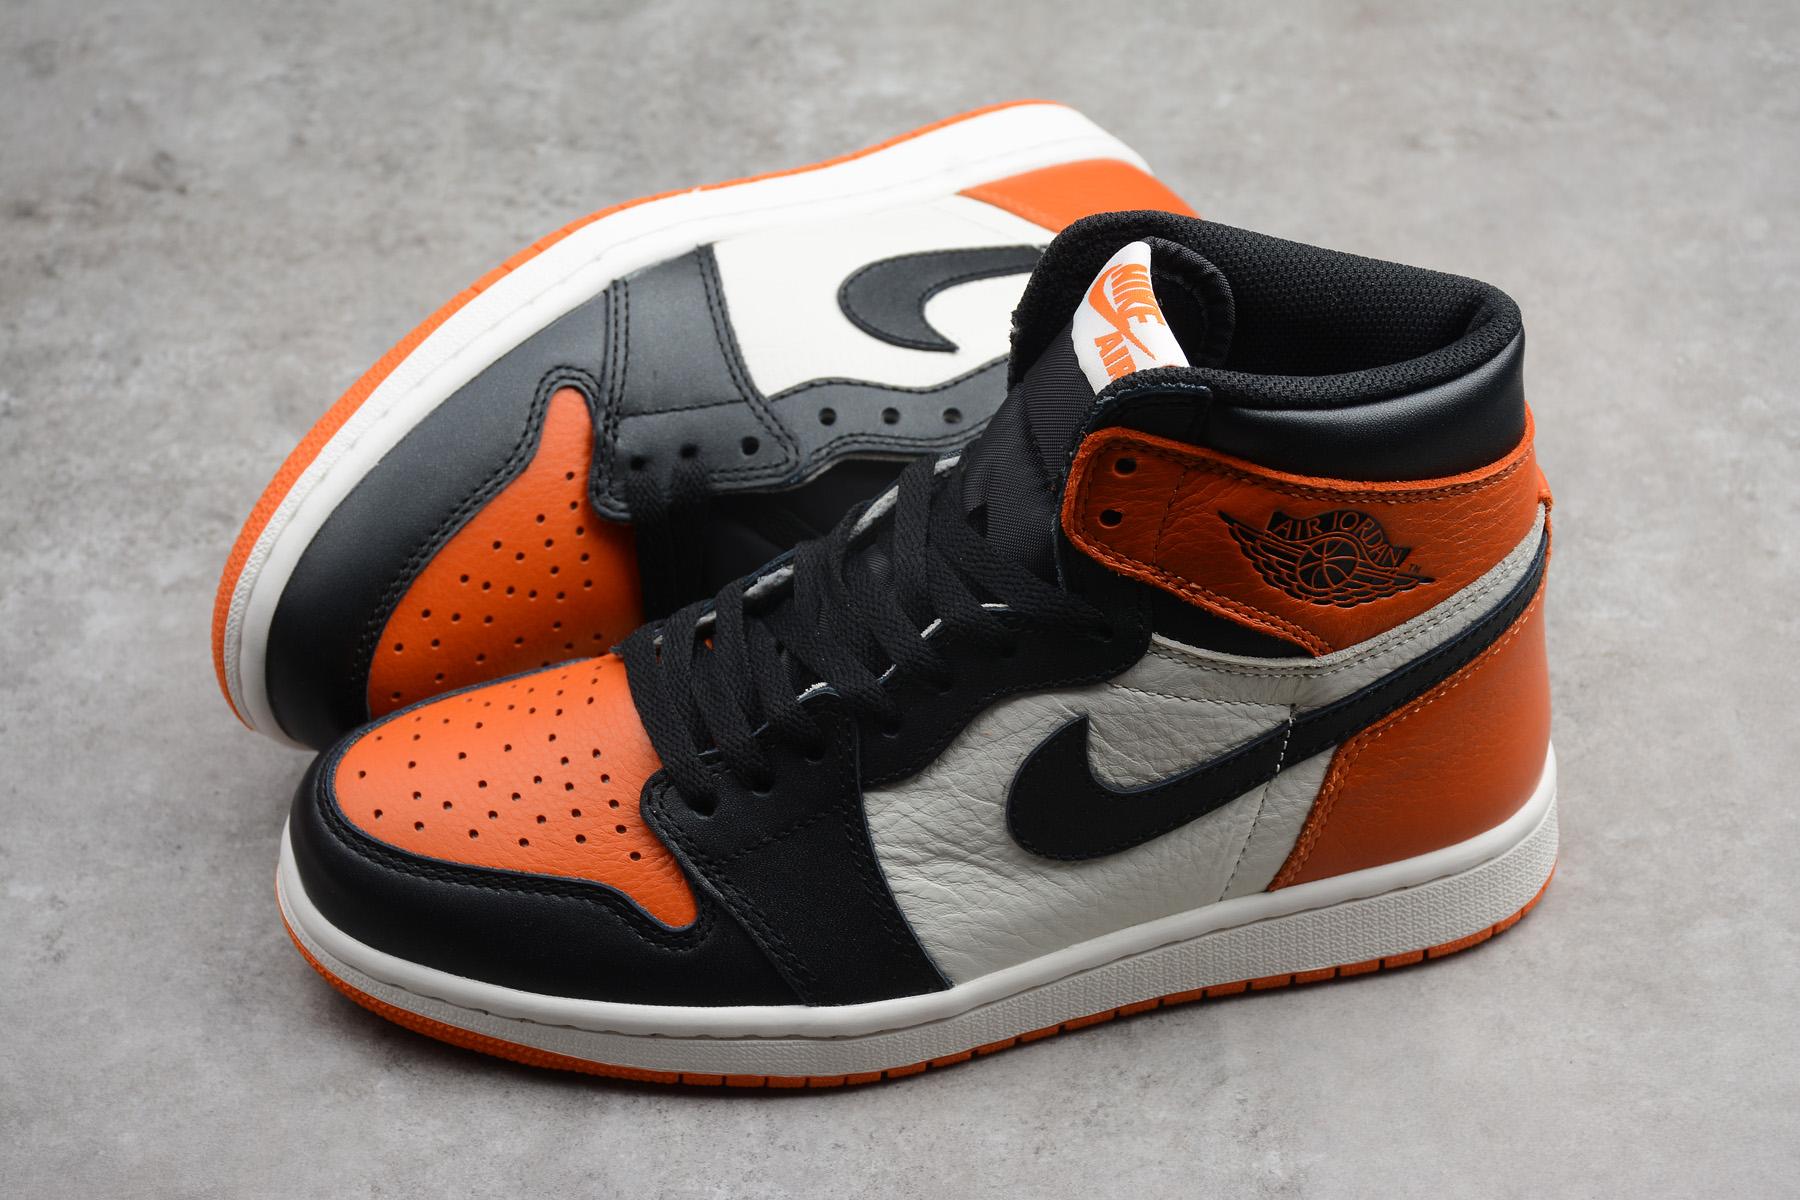 size 40 905ce 4894b Nike Air Jordan 1 Retro High Satin Shattered Backboard Shoes